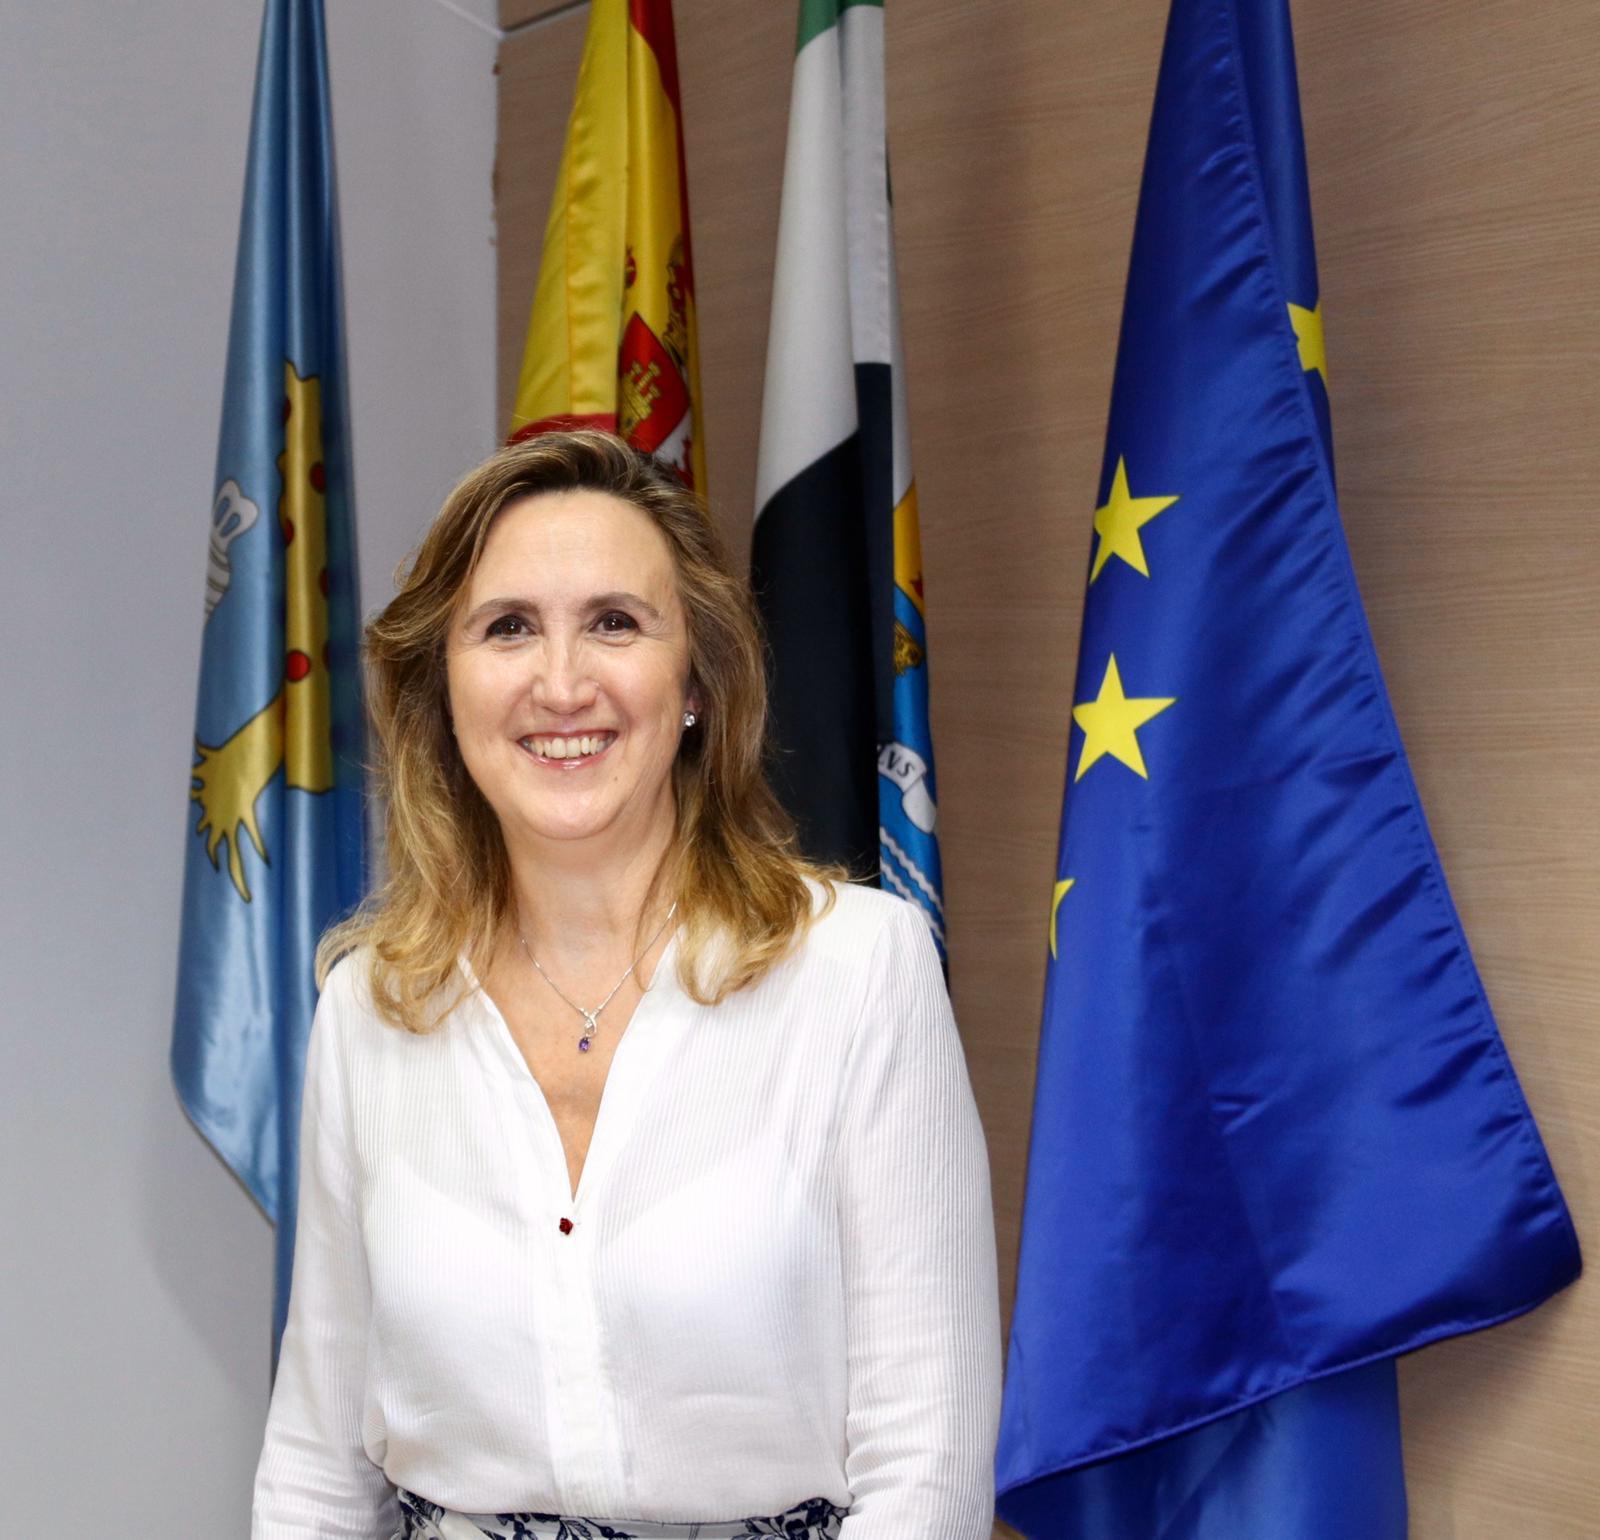 Mª Patricia González-Mohíno García-Carpintero